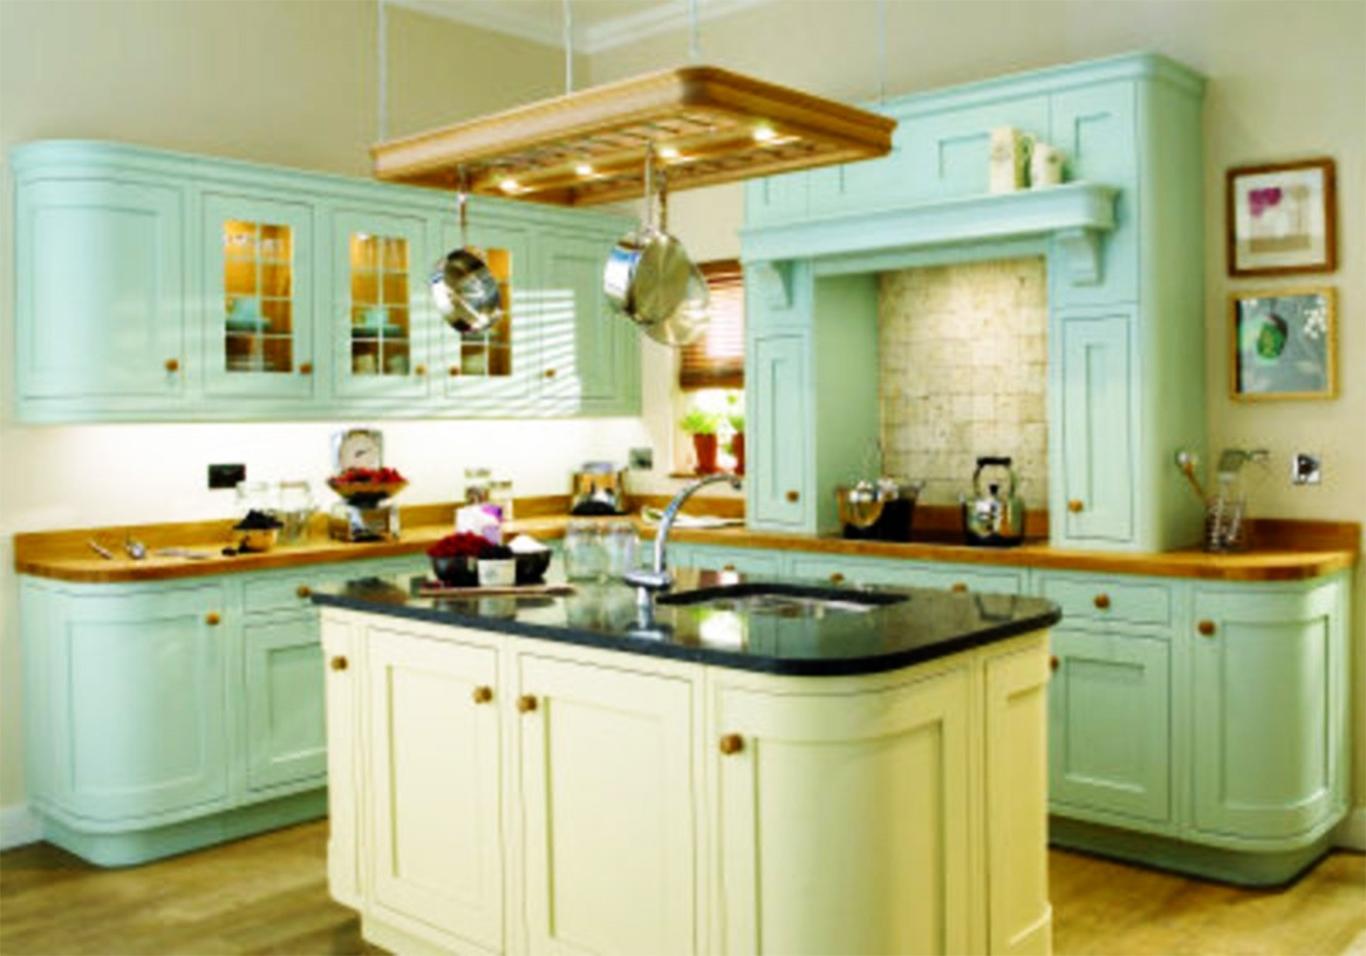 kitchen cabinets ideas diy photo - 8